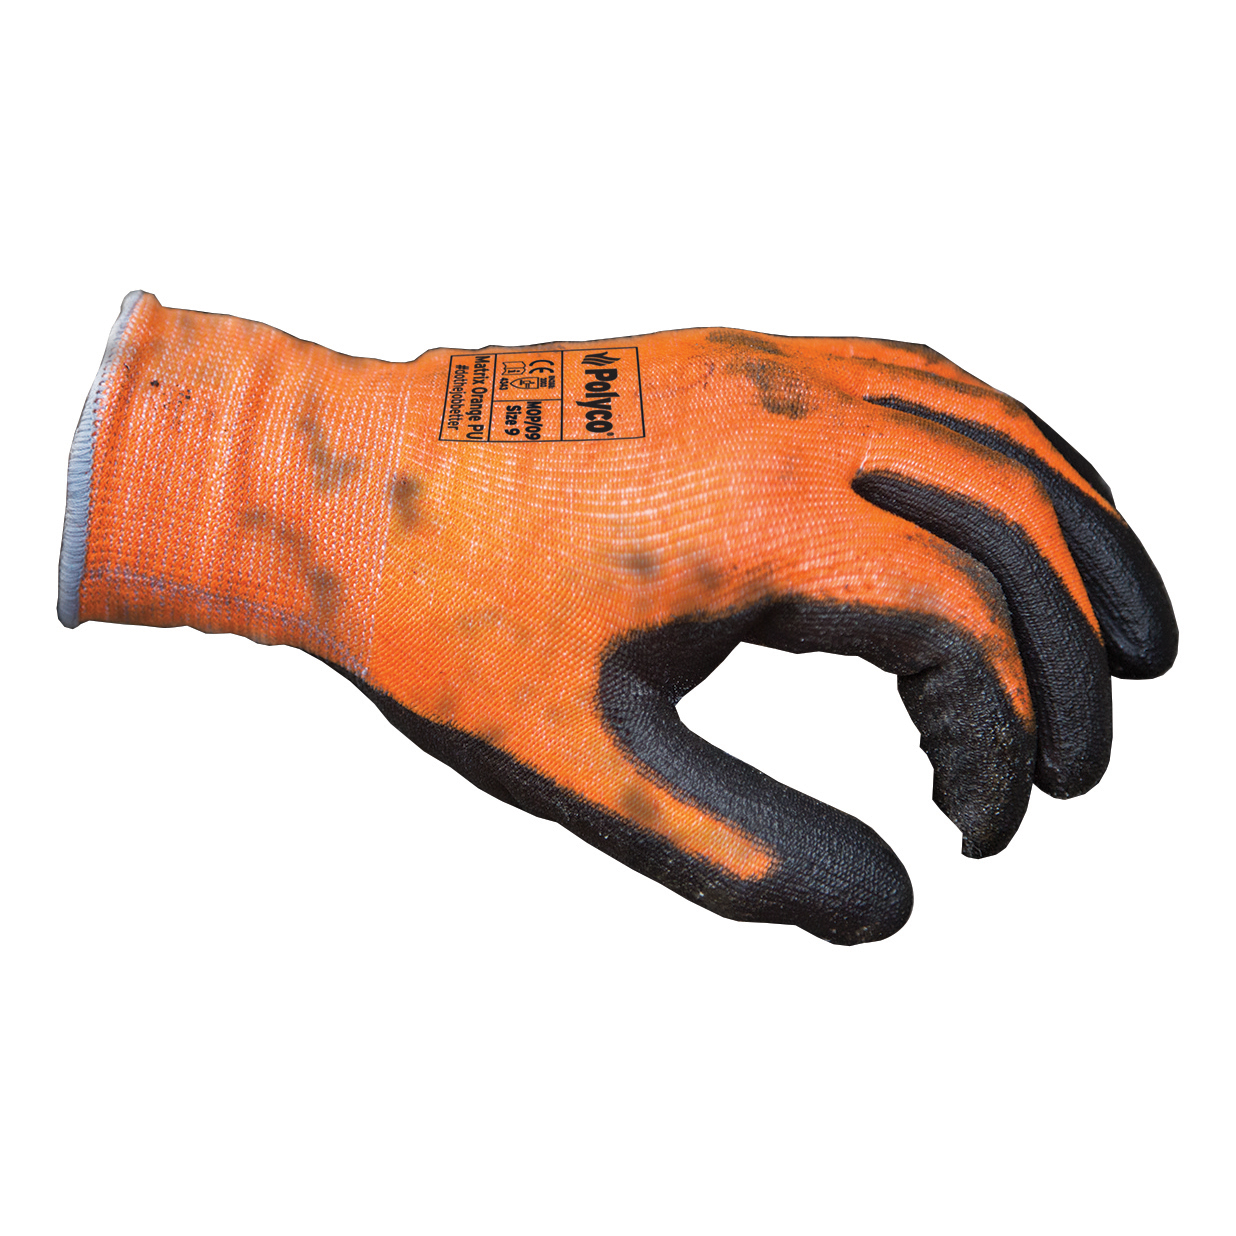 Polyco Safety Gloves PU Coated Size 8 Orange/Black [Pair] Ref MOP/08